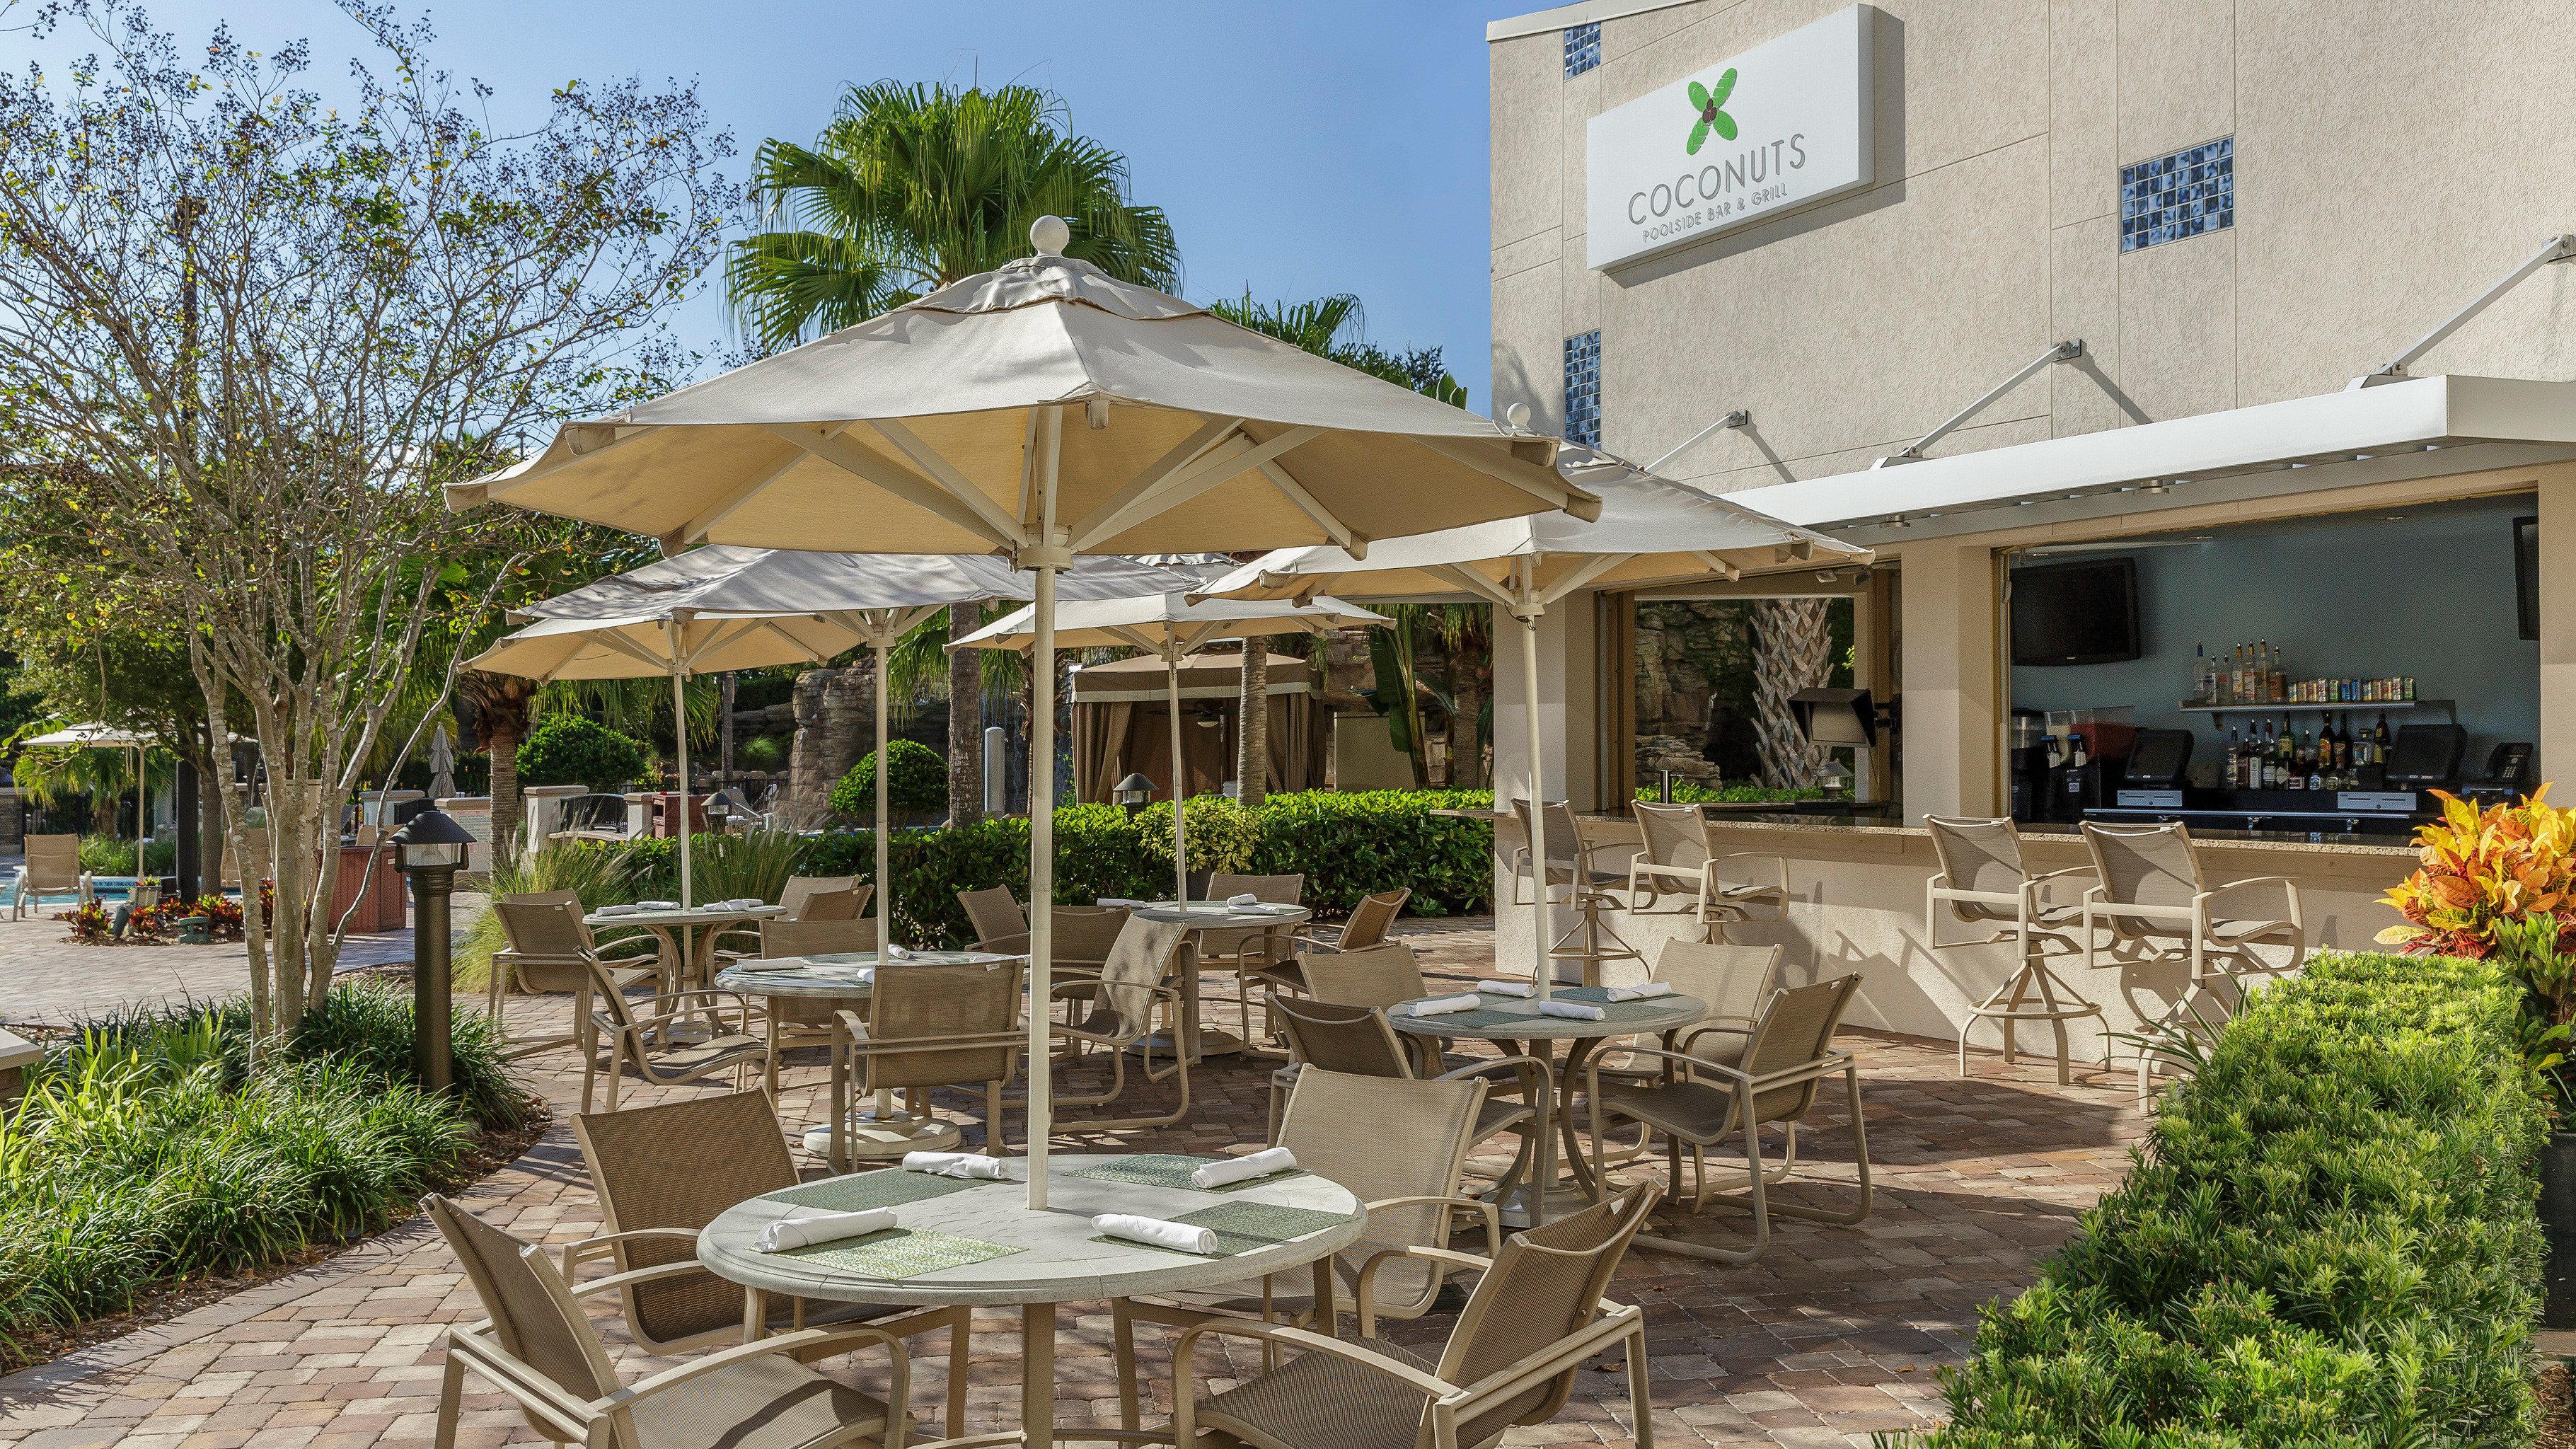 Dining Drink Eat Lounge tree ground chair building property Resort restaurant outdoor structure Villa Patio backyard Deck